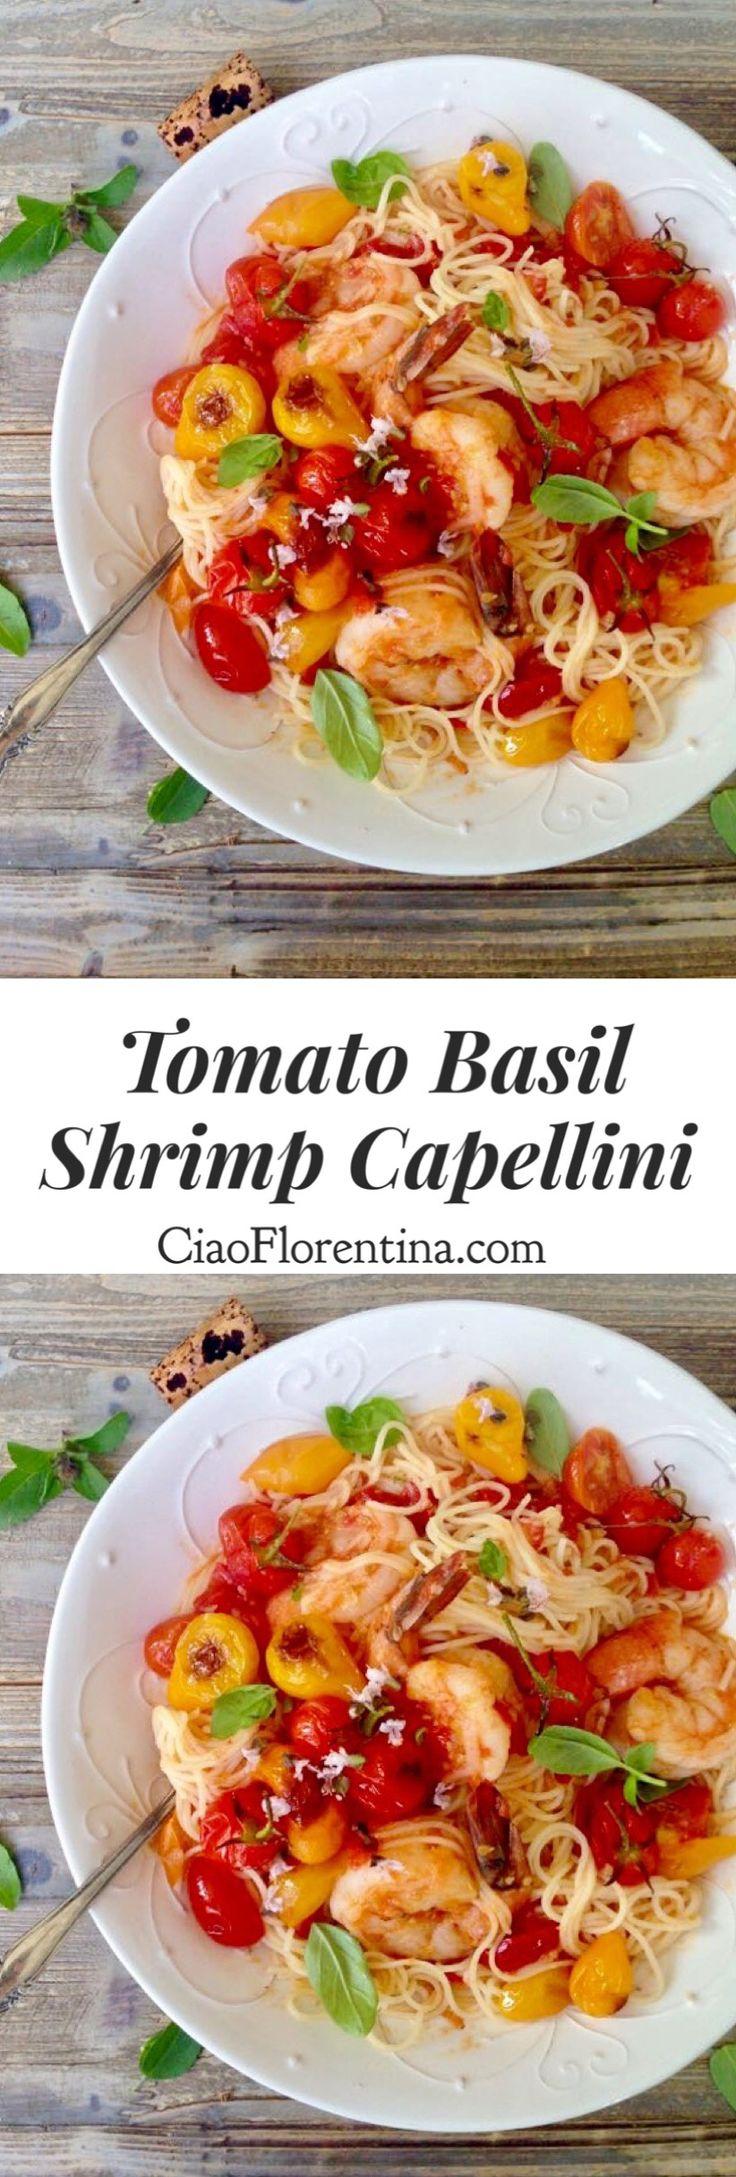 Fresh Tomato Basil Sauce with Garlic Shrimp Capellini Pasta | CiaoFlorentina.com @CiaoFlorentina